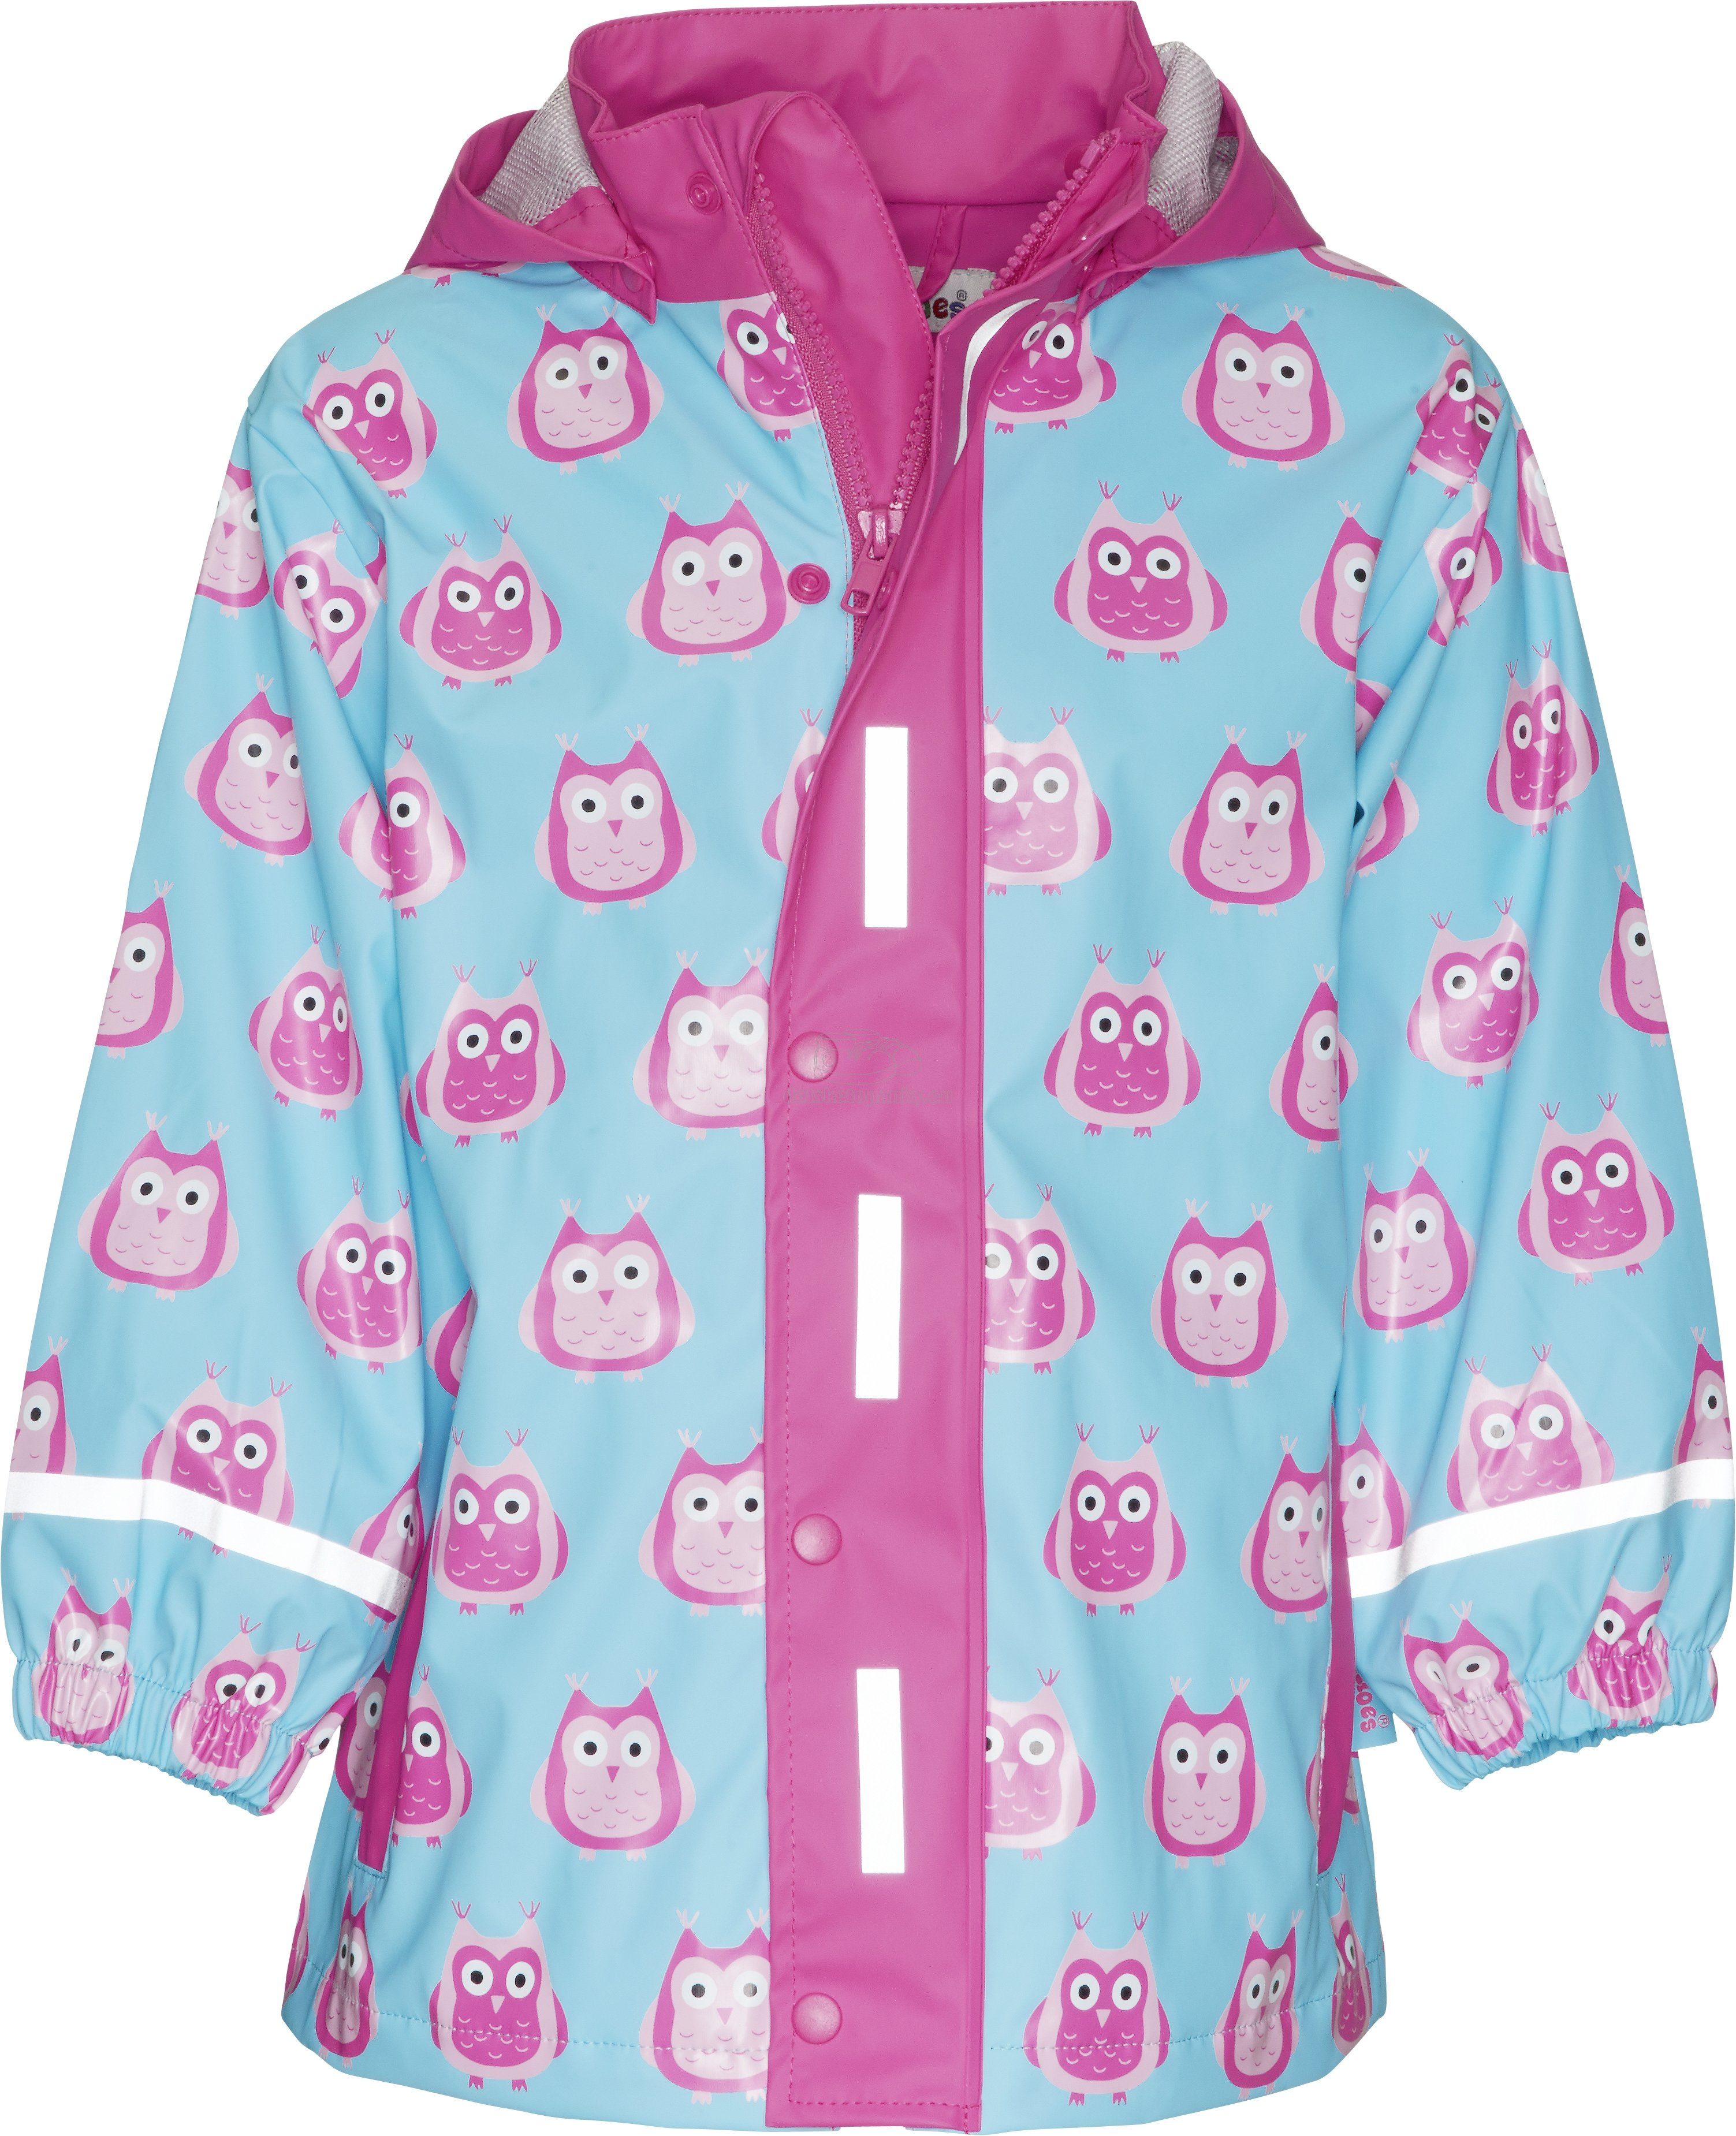 Pláštenka Playshoes 408599 Owls